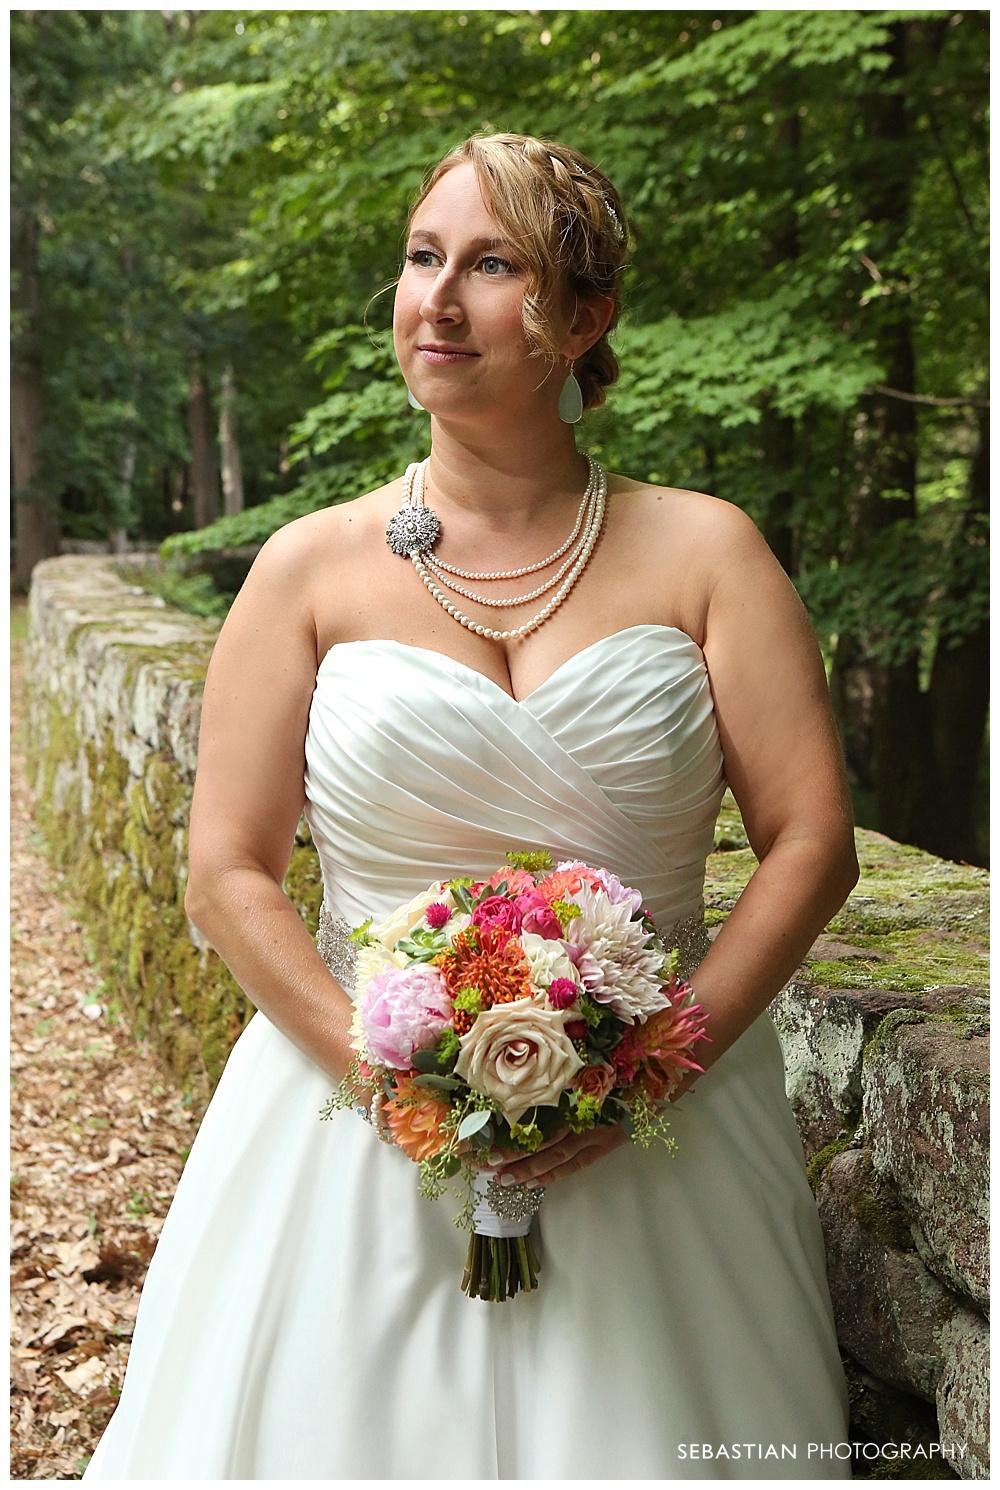 Sebastian_Photography_Wadsworth_Mansion_Wedding_Pictures_CT_14.jpg